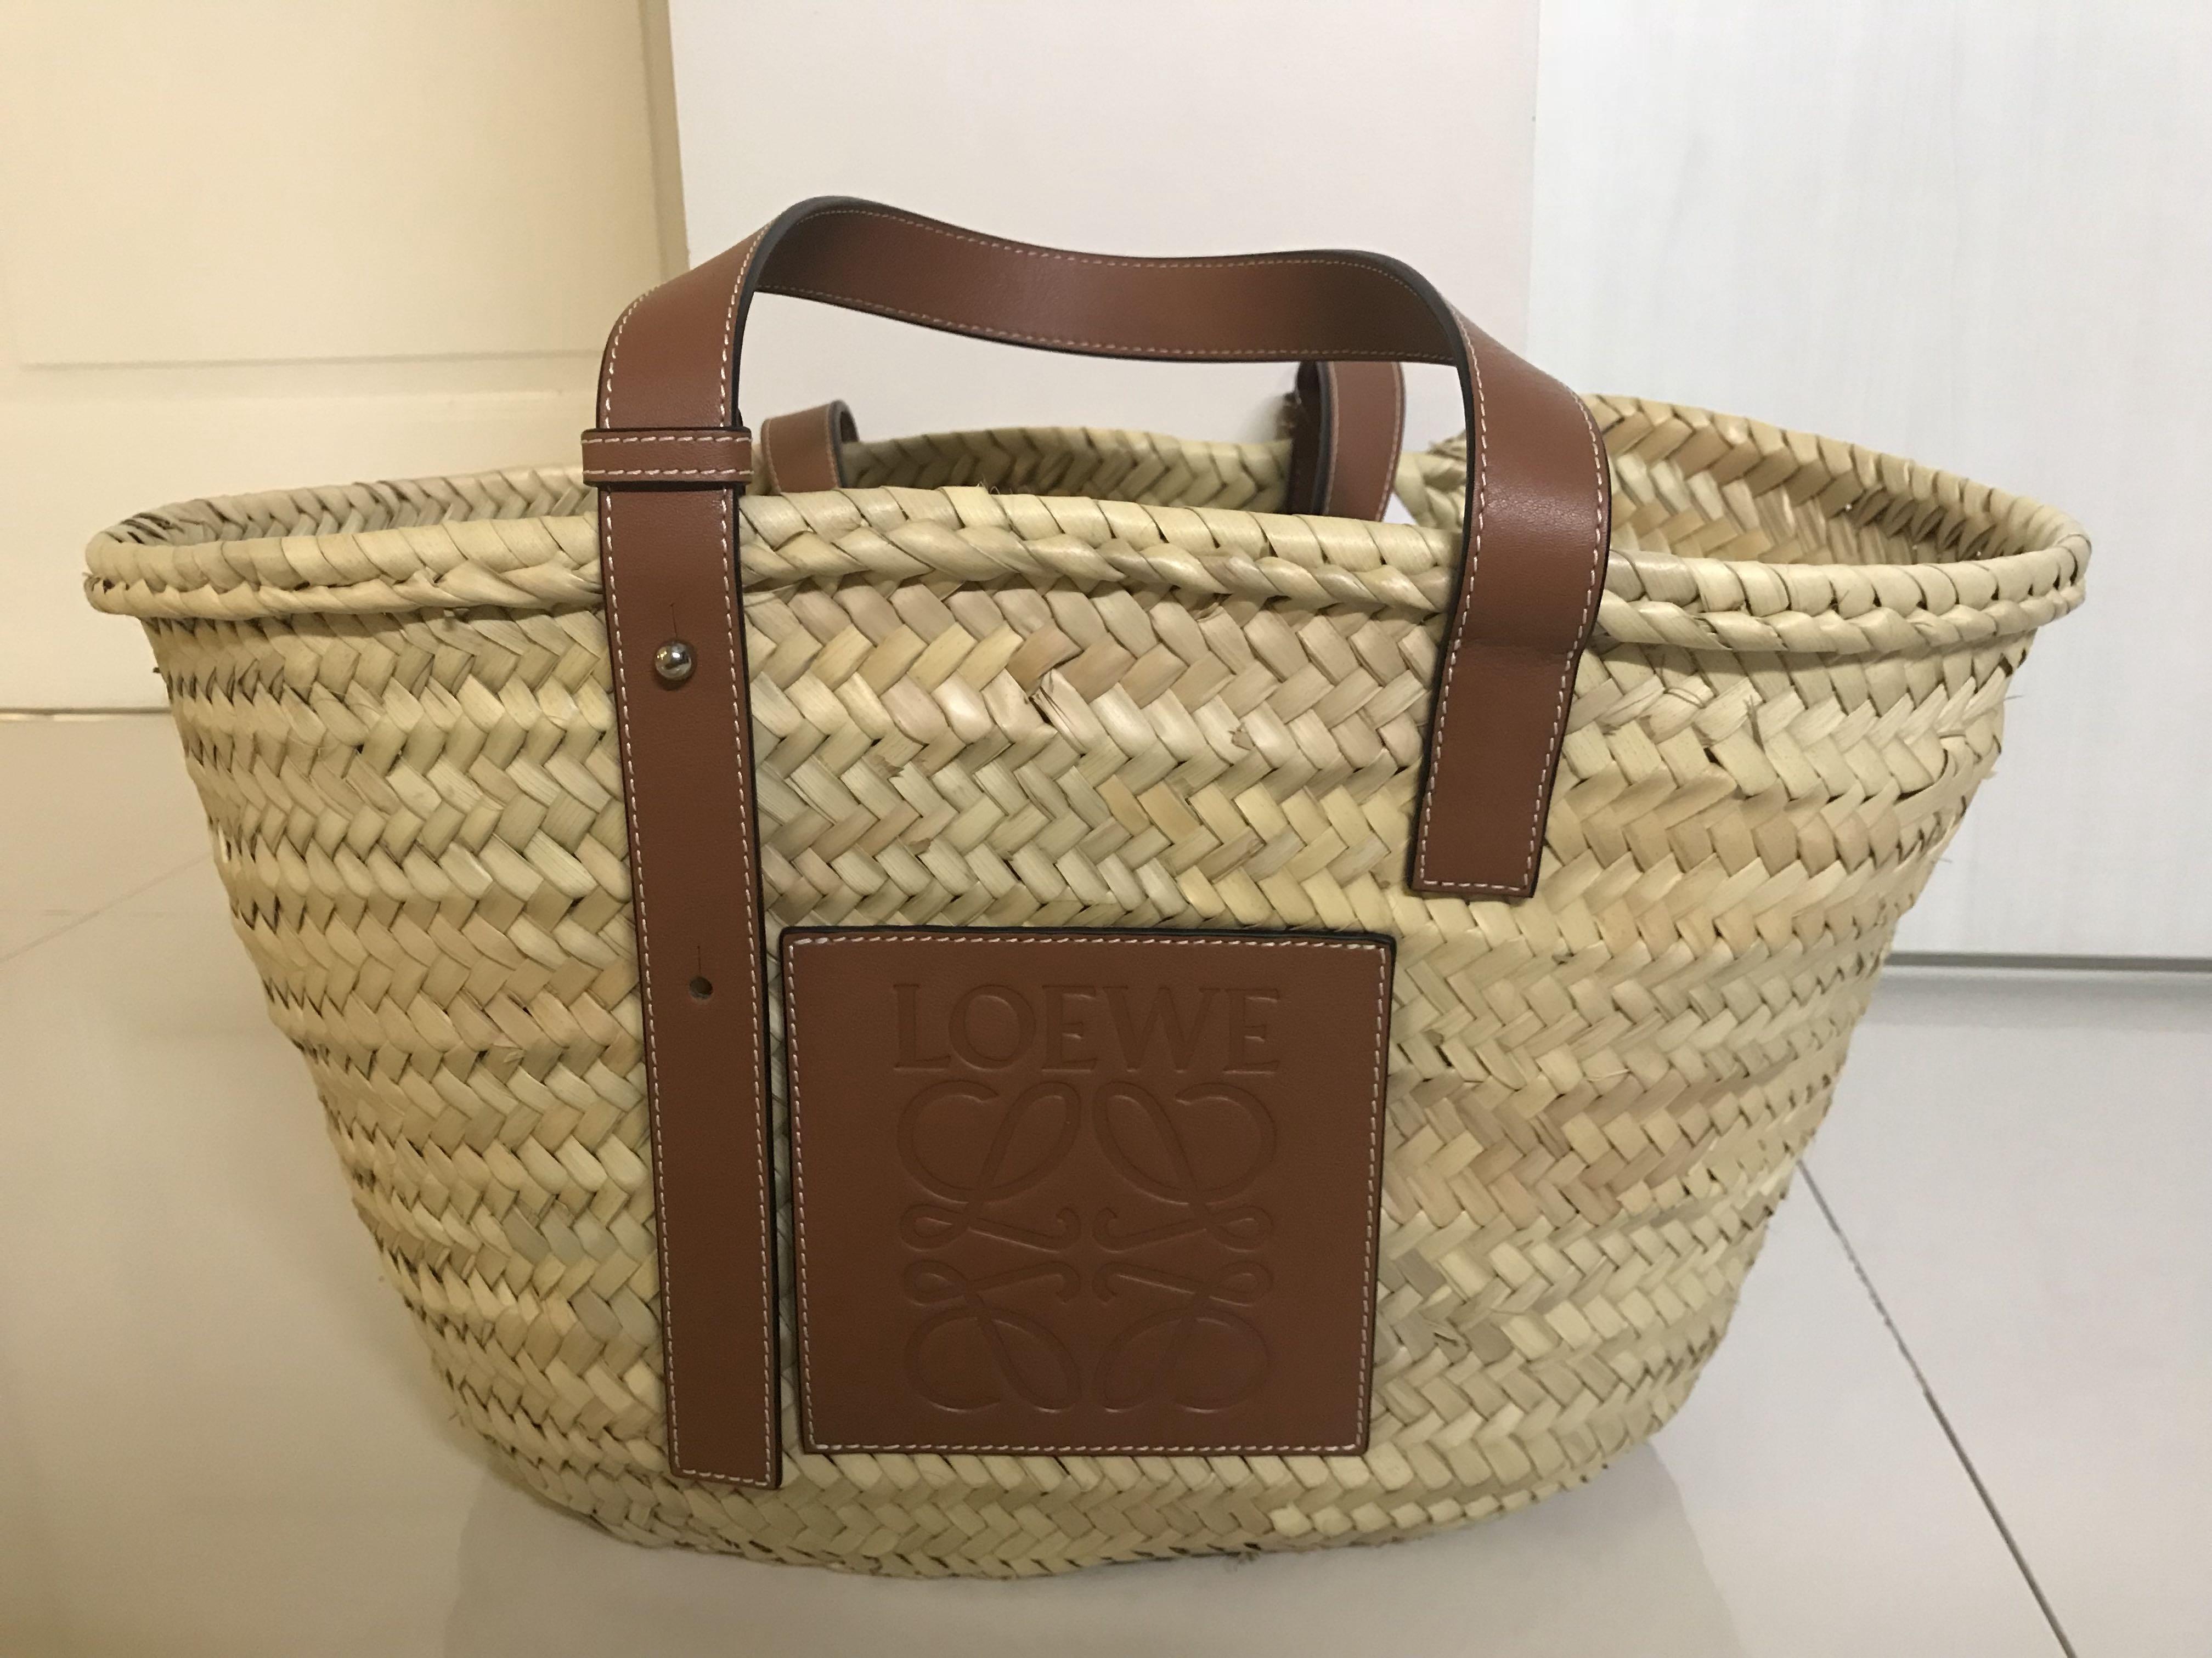 b10bb02279e BNIB Loewe raffia basket bag tote! Sold out everywhere, Women's Fashion,  Bags & Wallets, Handbags on Carousell